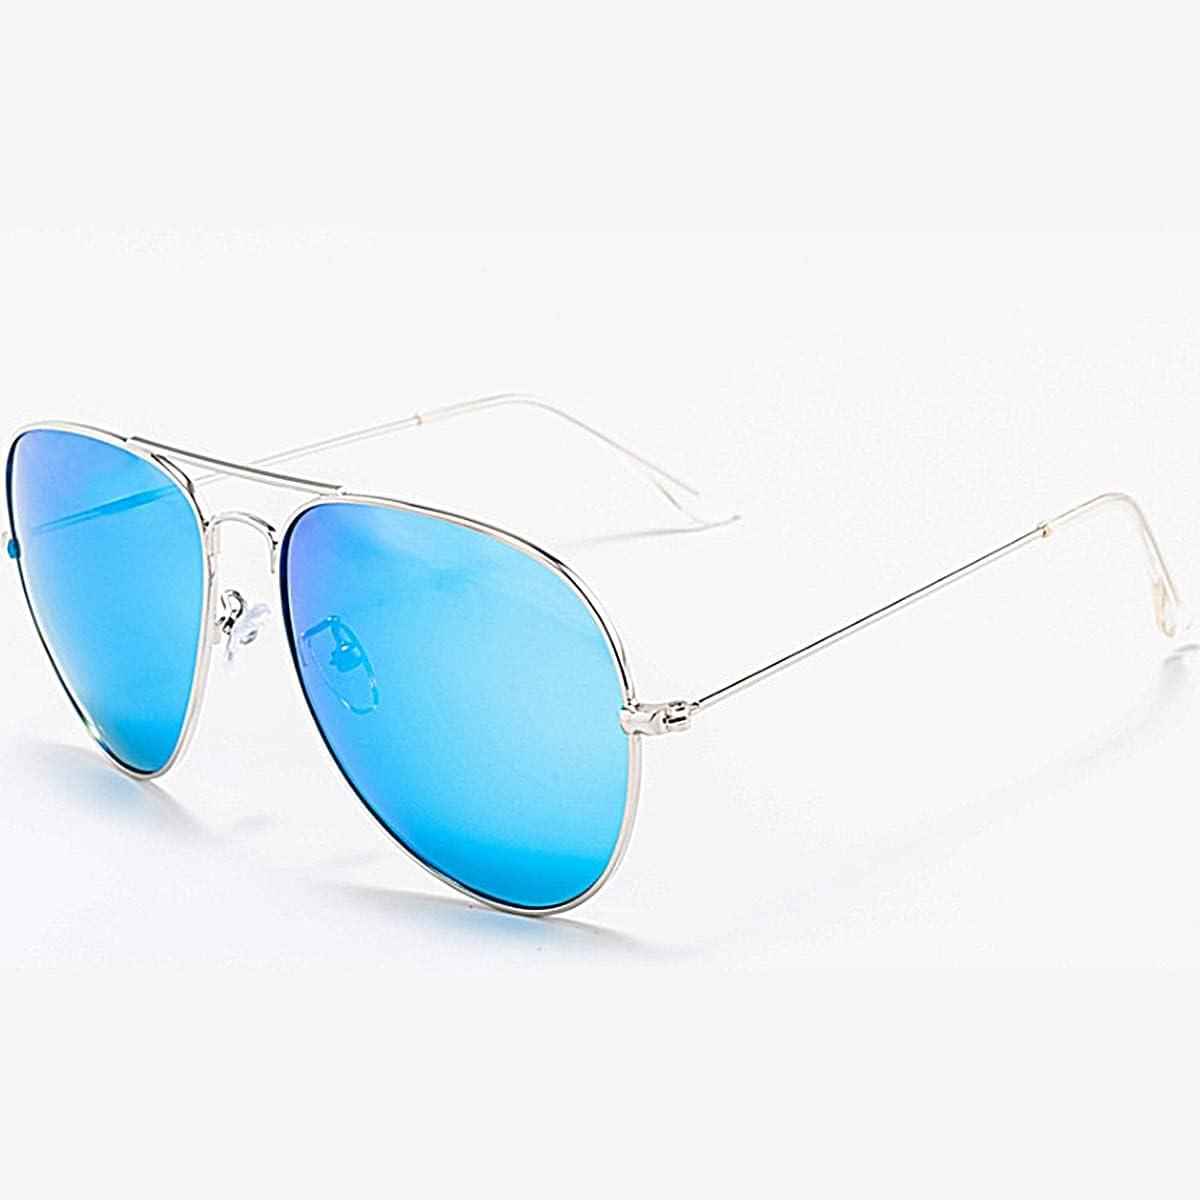 Lopez Popular standard Kent Toad Goggles Polarizing Sunglasses Pilo Now on sale Women's Men's